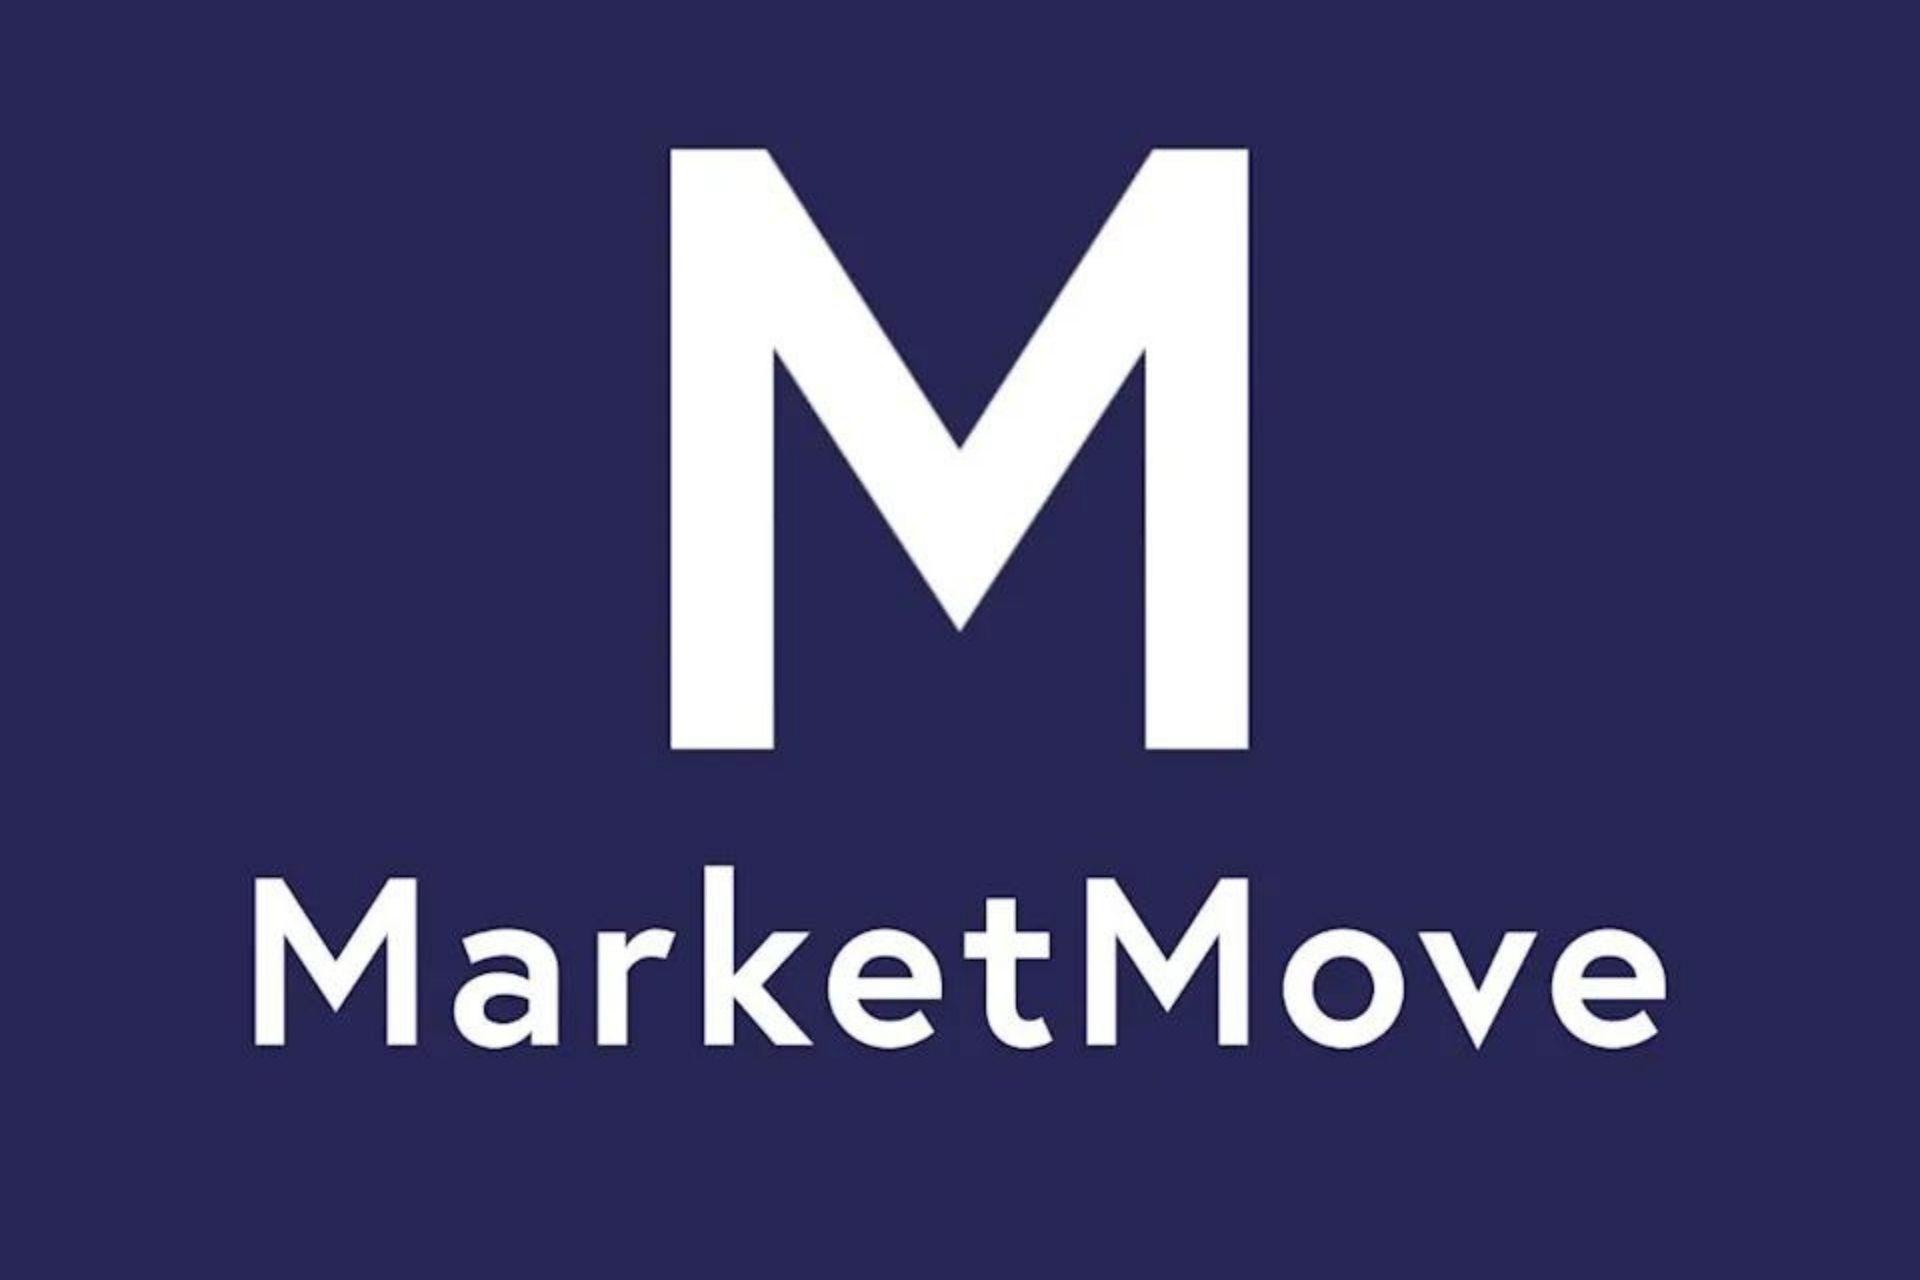 MarketMove   Using Artificial Intelligence to Help Investors Make Smart & Safe Decisions